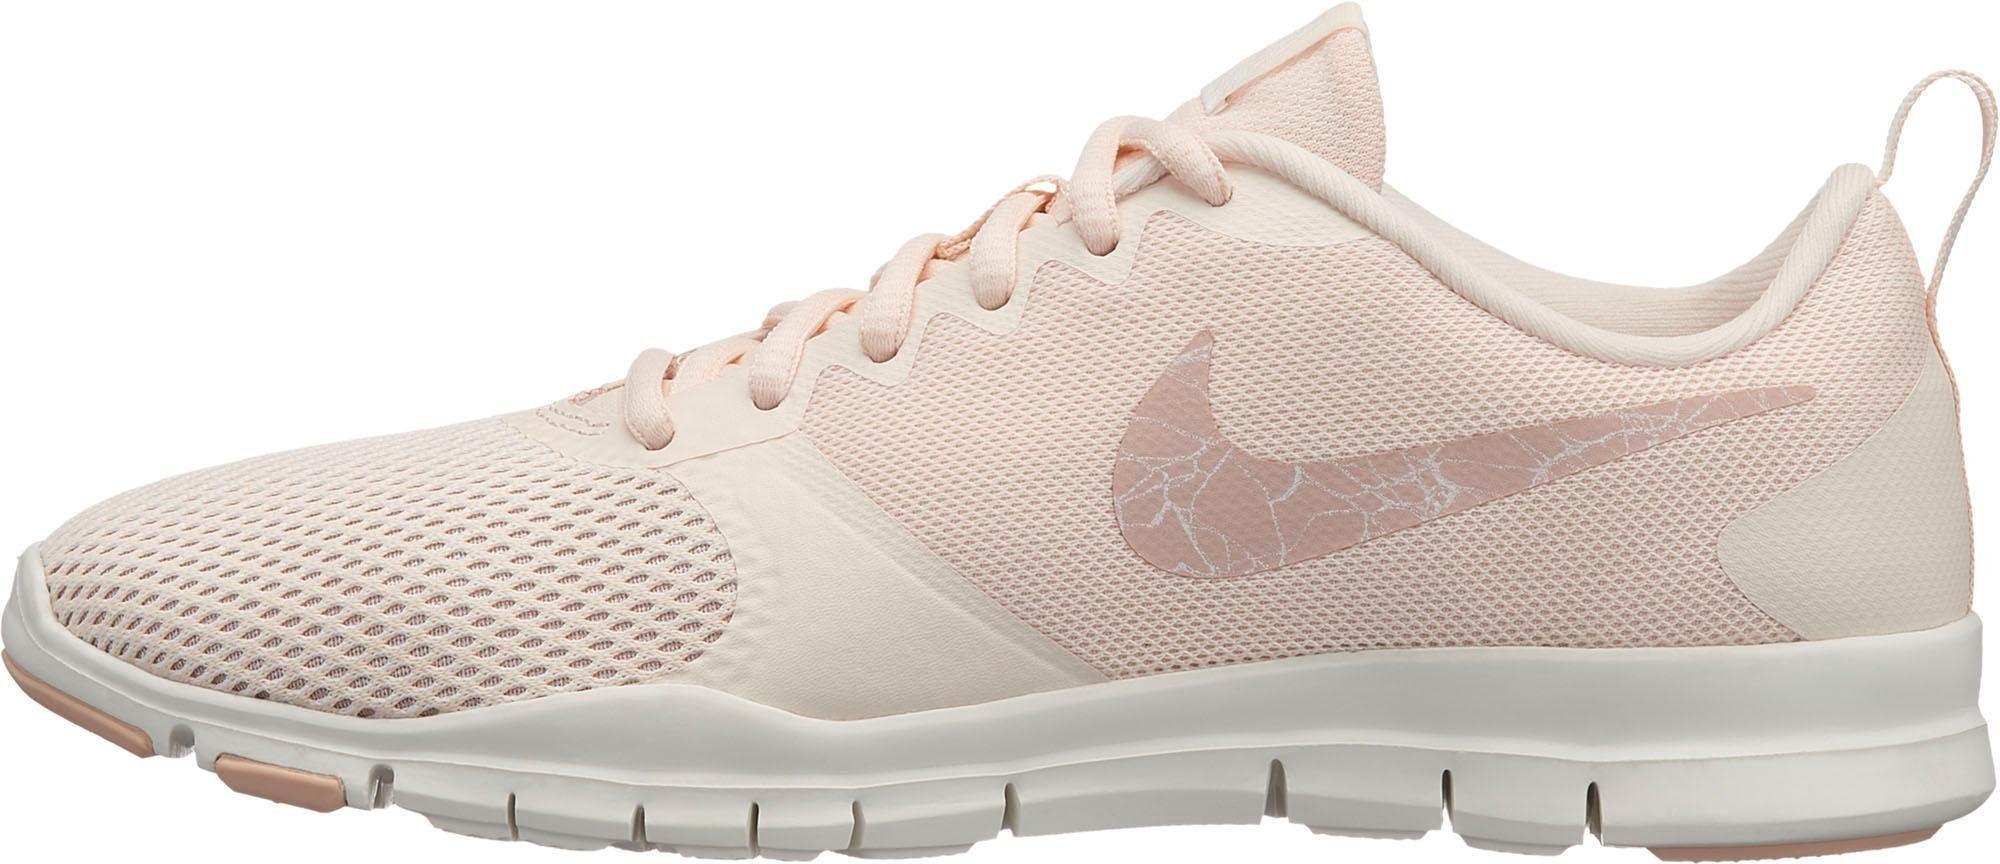 Nike fitnessschoenen »Wmns Flex Essential«